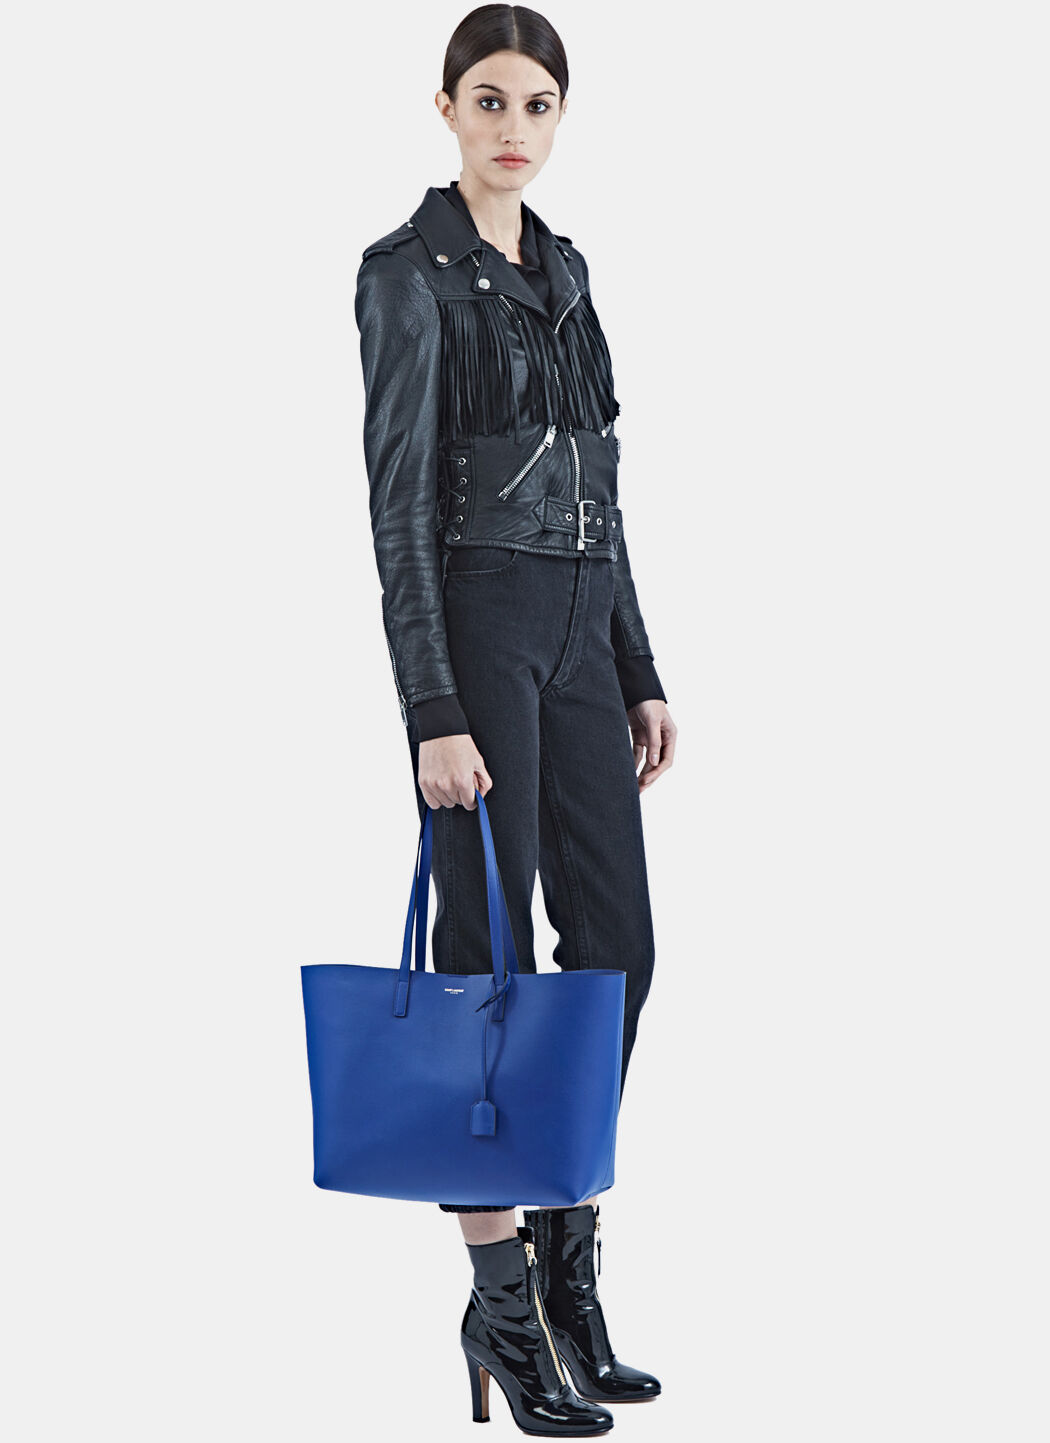 saint laurent shopping bag - monogram saint laurent crossbody phone pouch in ultramarine leather